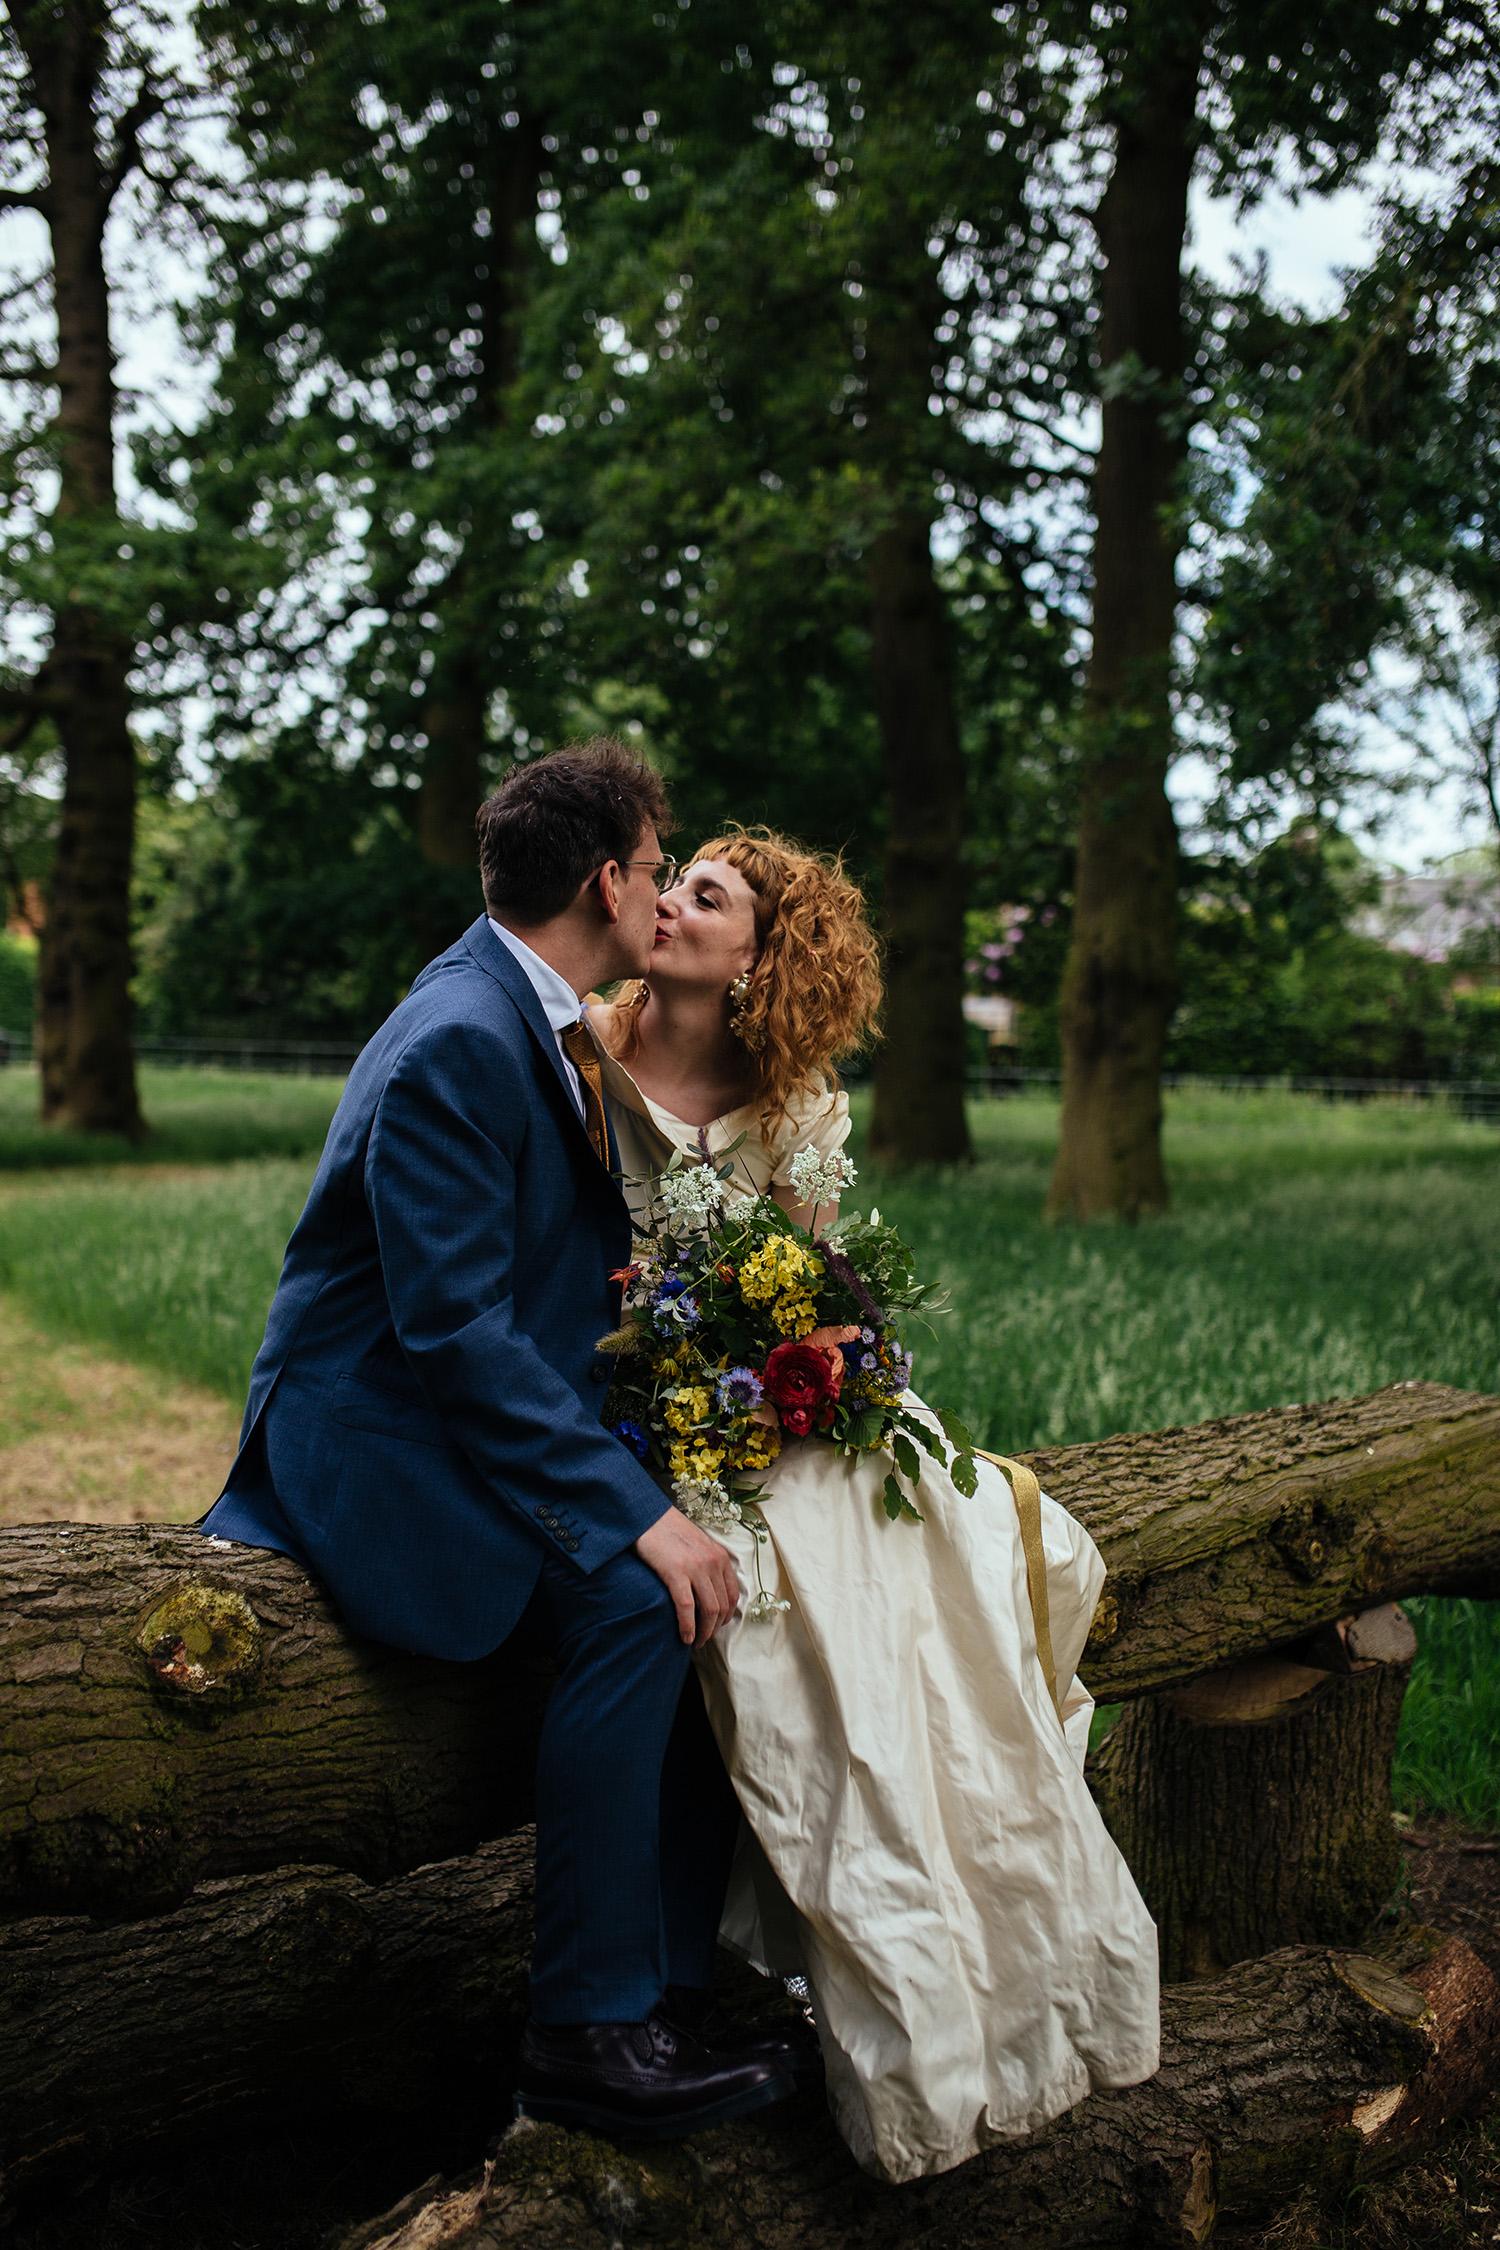 Manchester Wes Anderson Village Hall Wedding 103.jpg